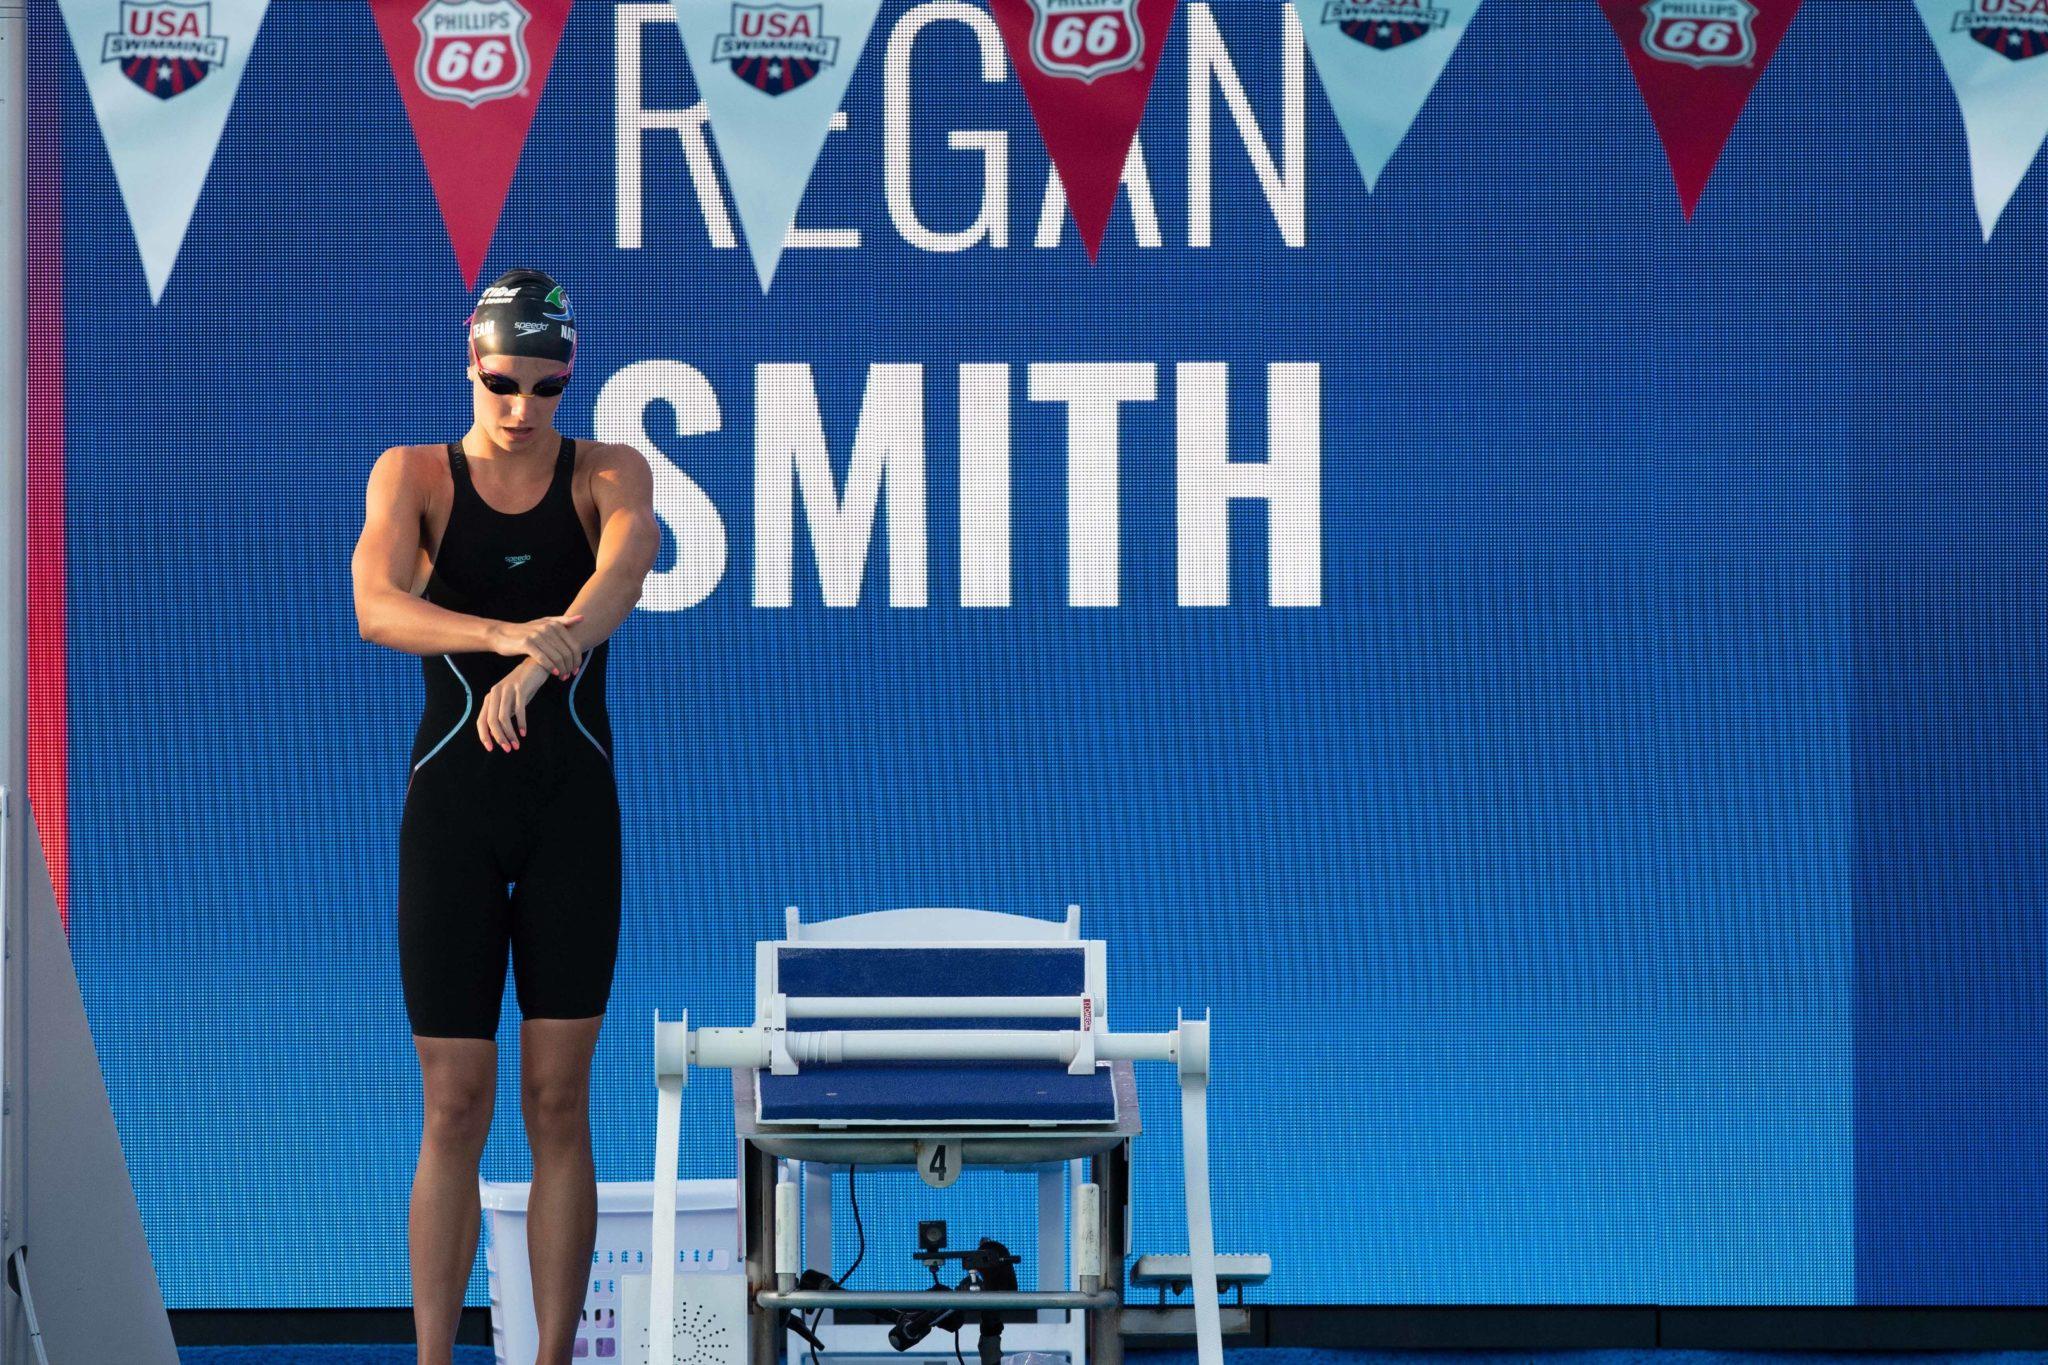 Regan Smith Named to Time Magazine's Next 100 List